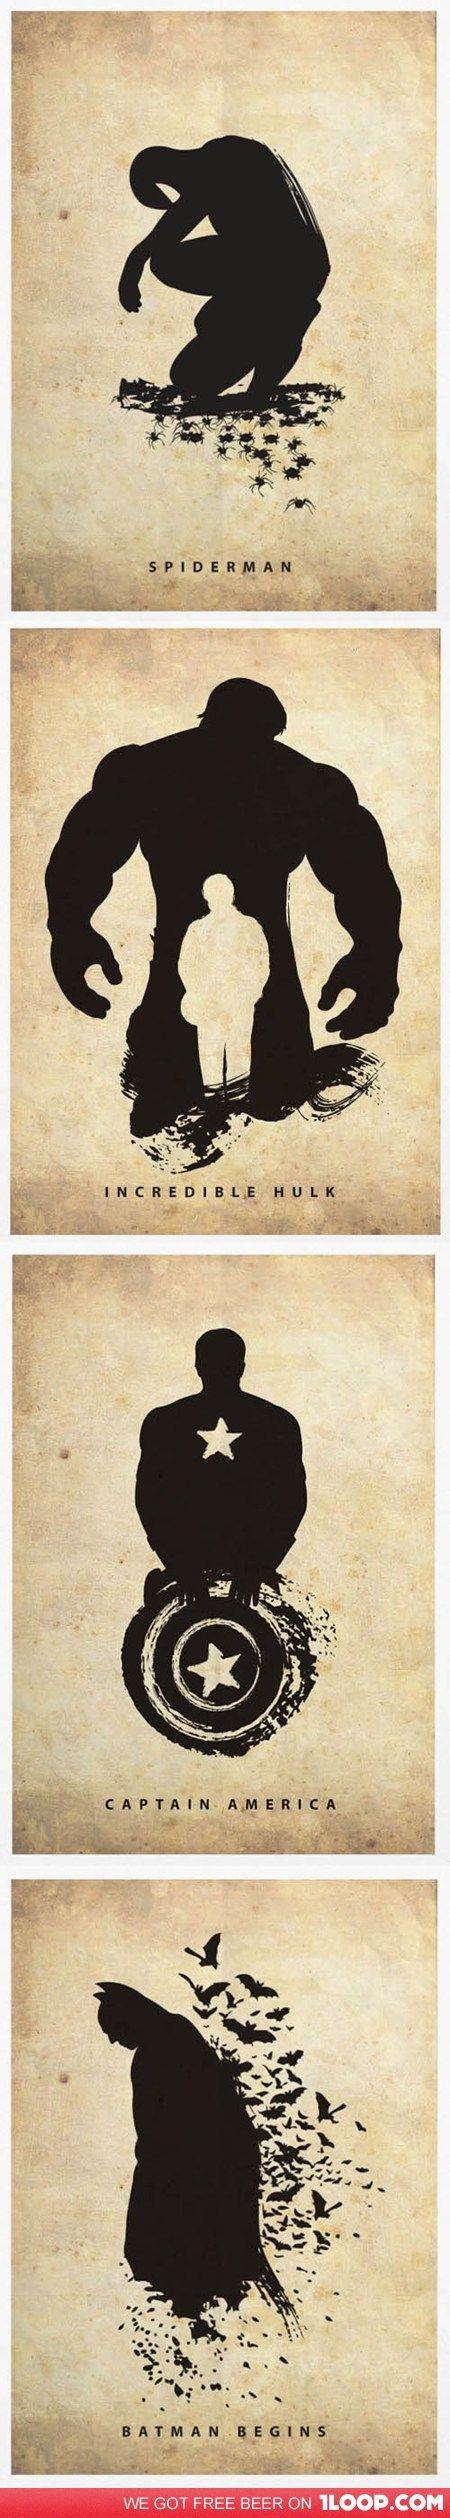 Spider-man, Hulk, Captain America, and Batman. totally sick.